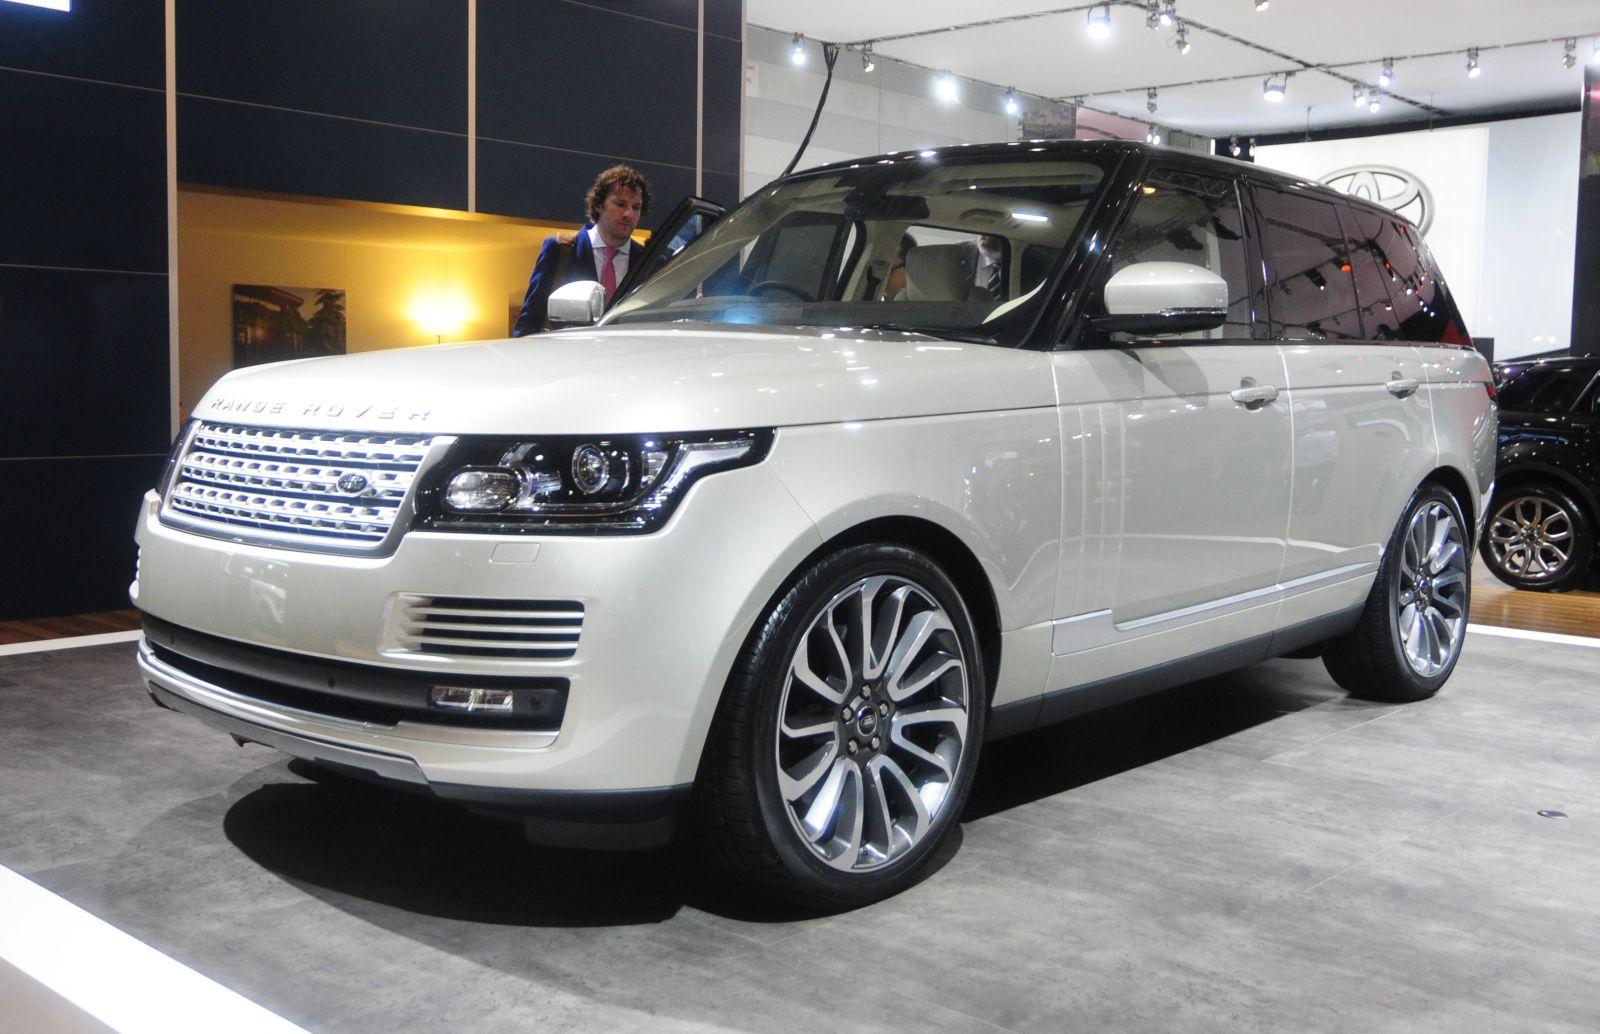 New Range Rover, Best Luxury Car 2012 ~ Automotive